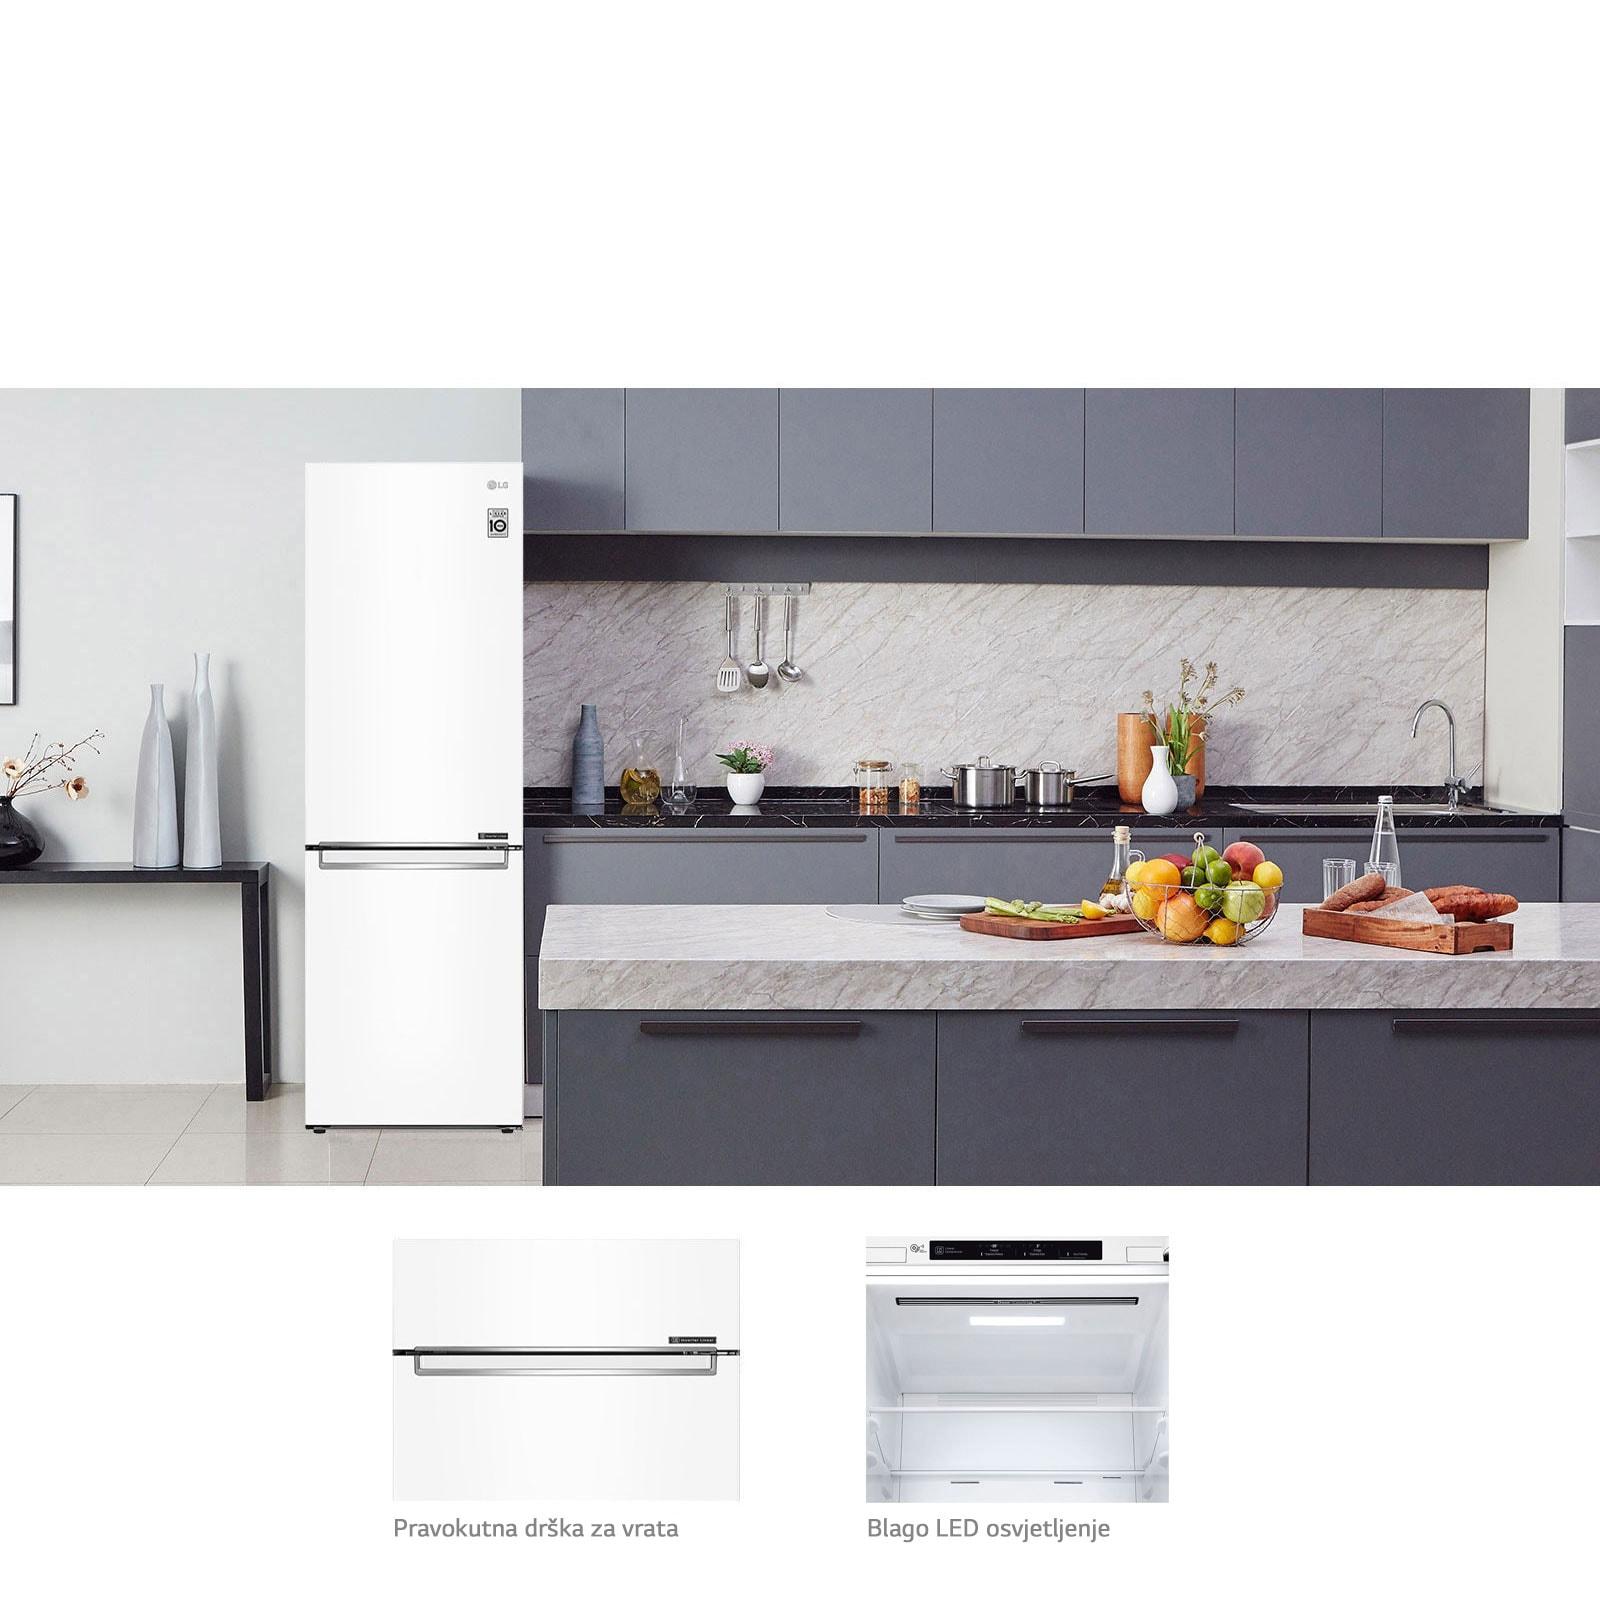 Elegantan i praktičan minimalizam